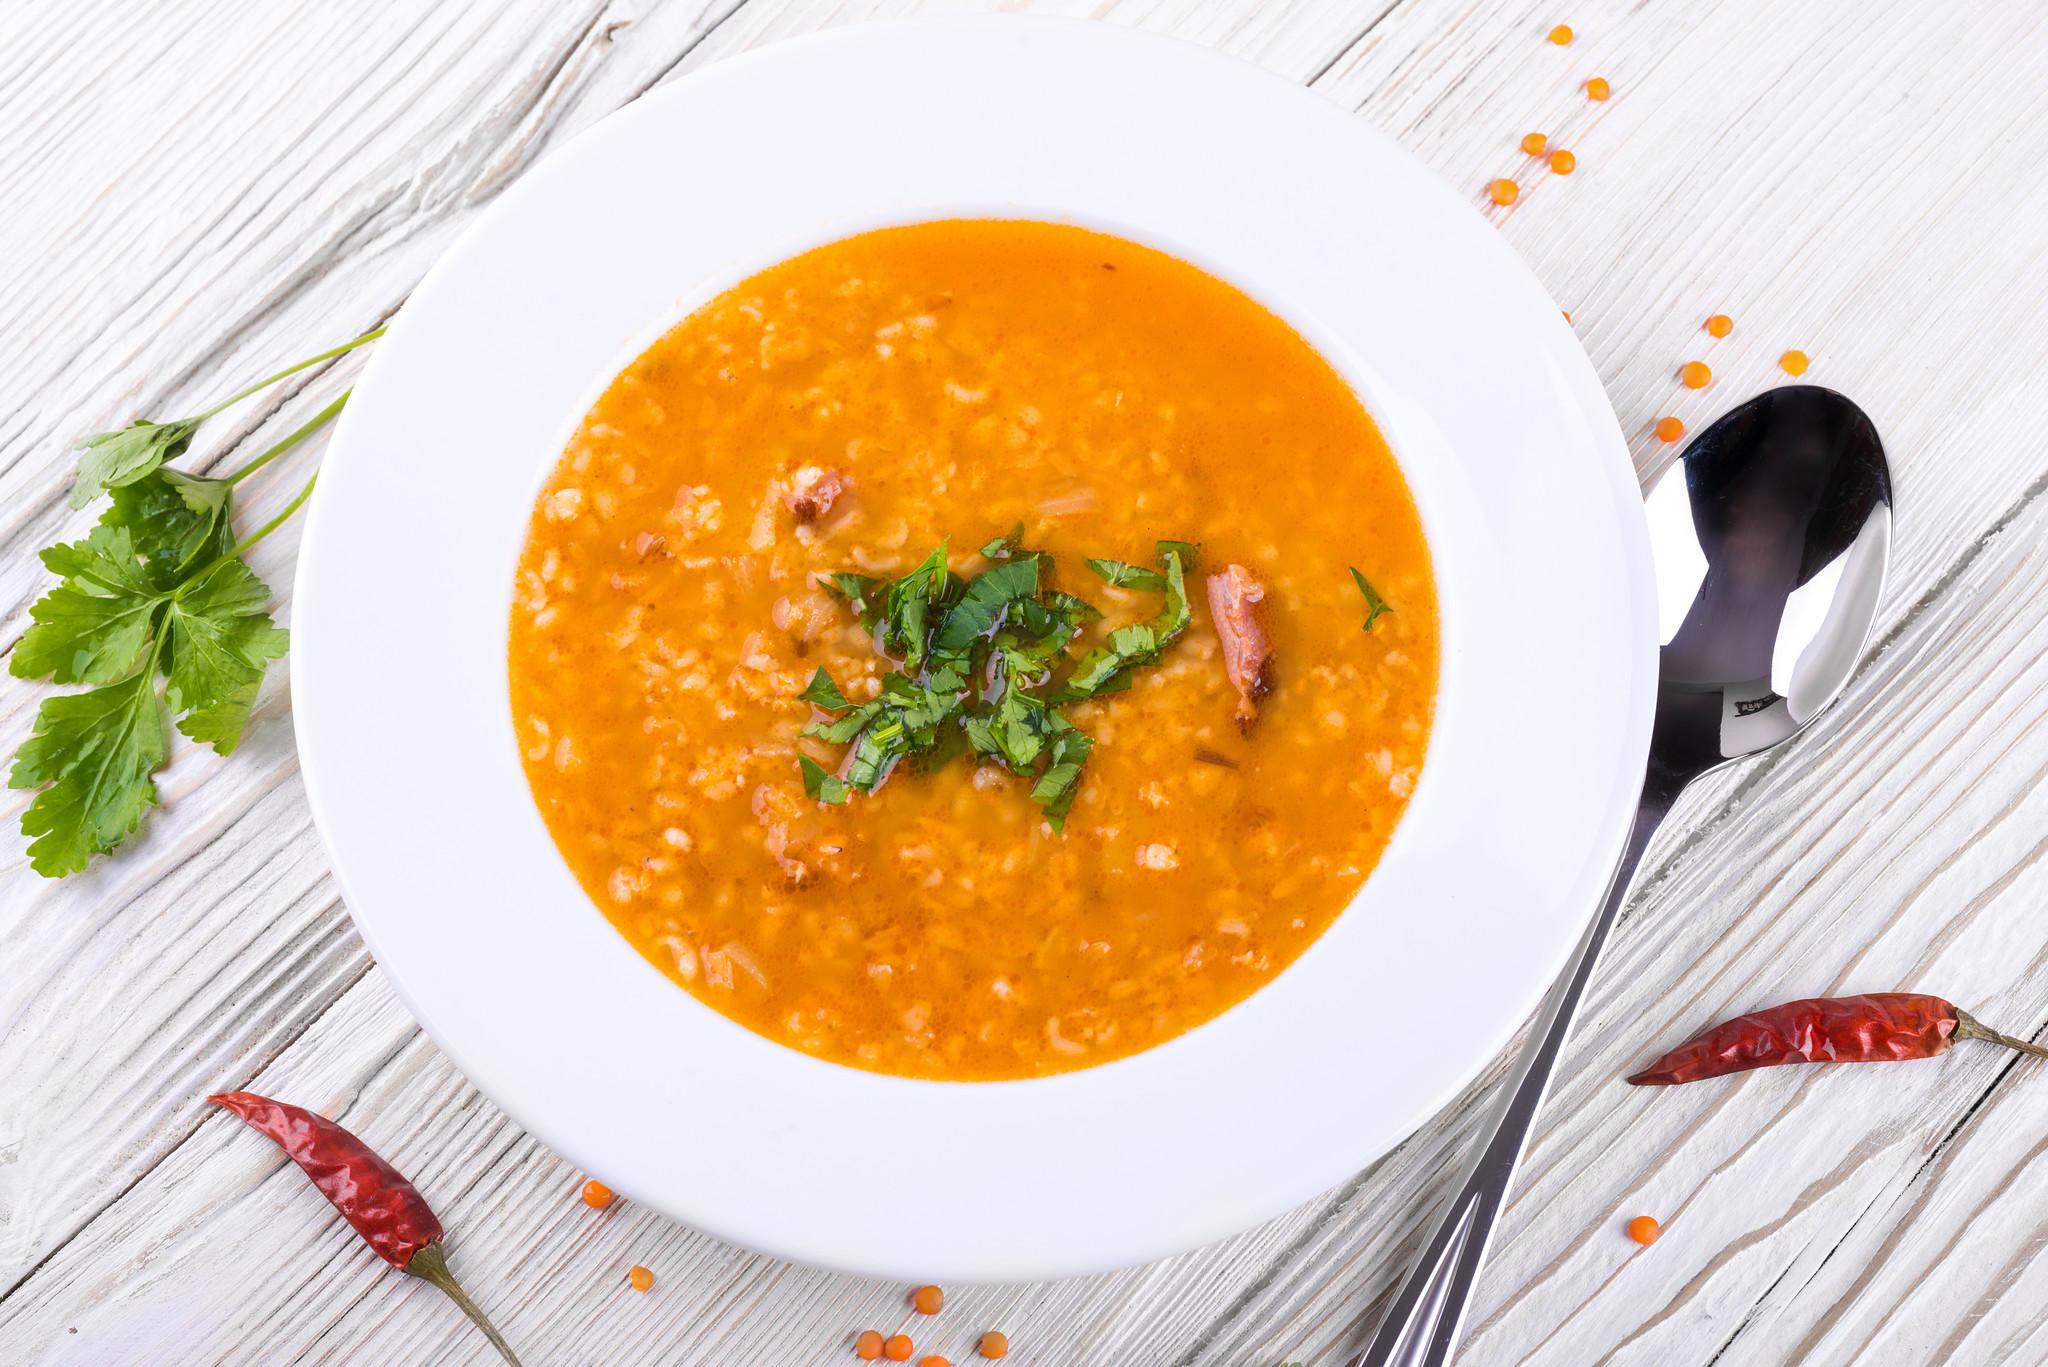 Lentil Tomato Soup (Serves 4)